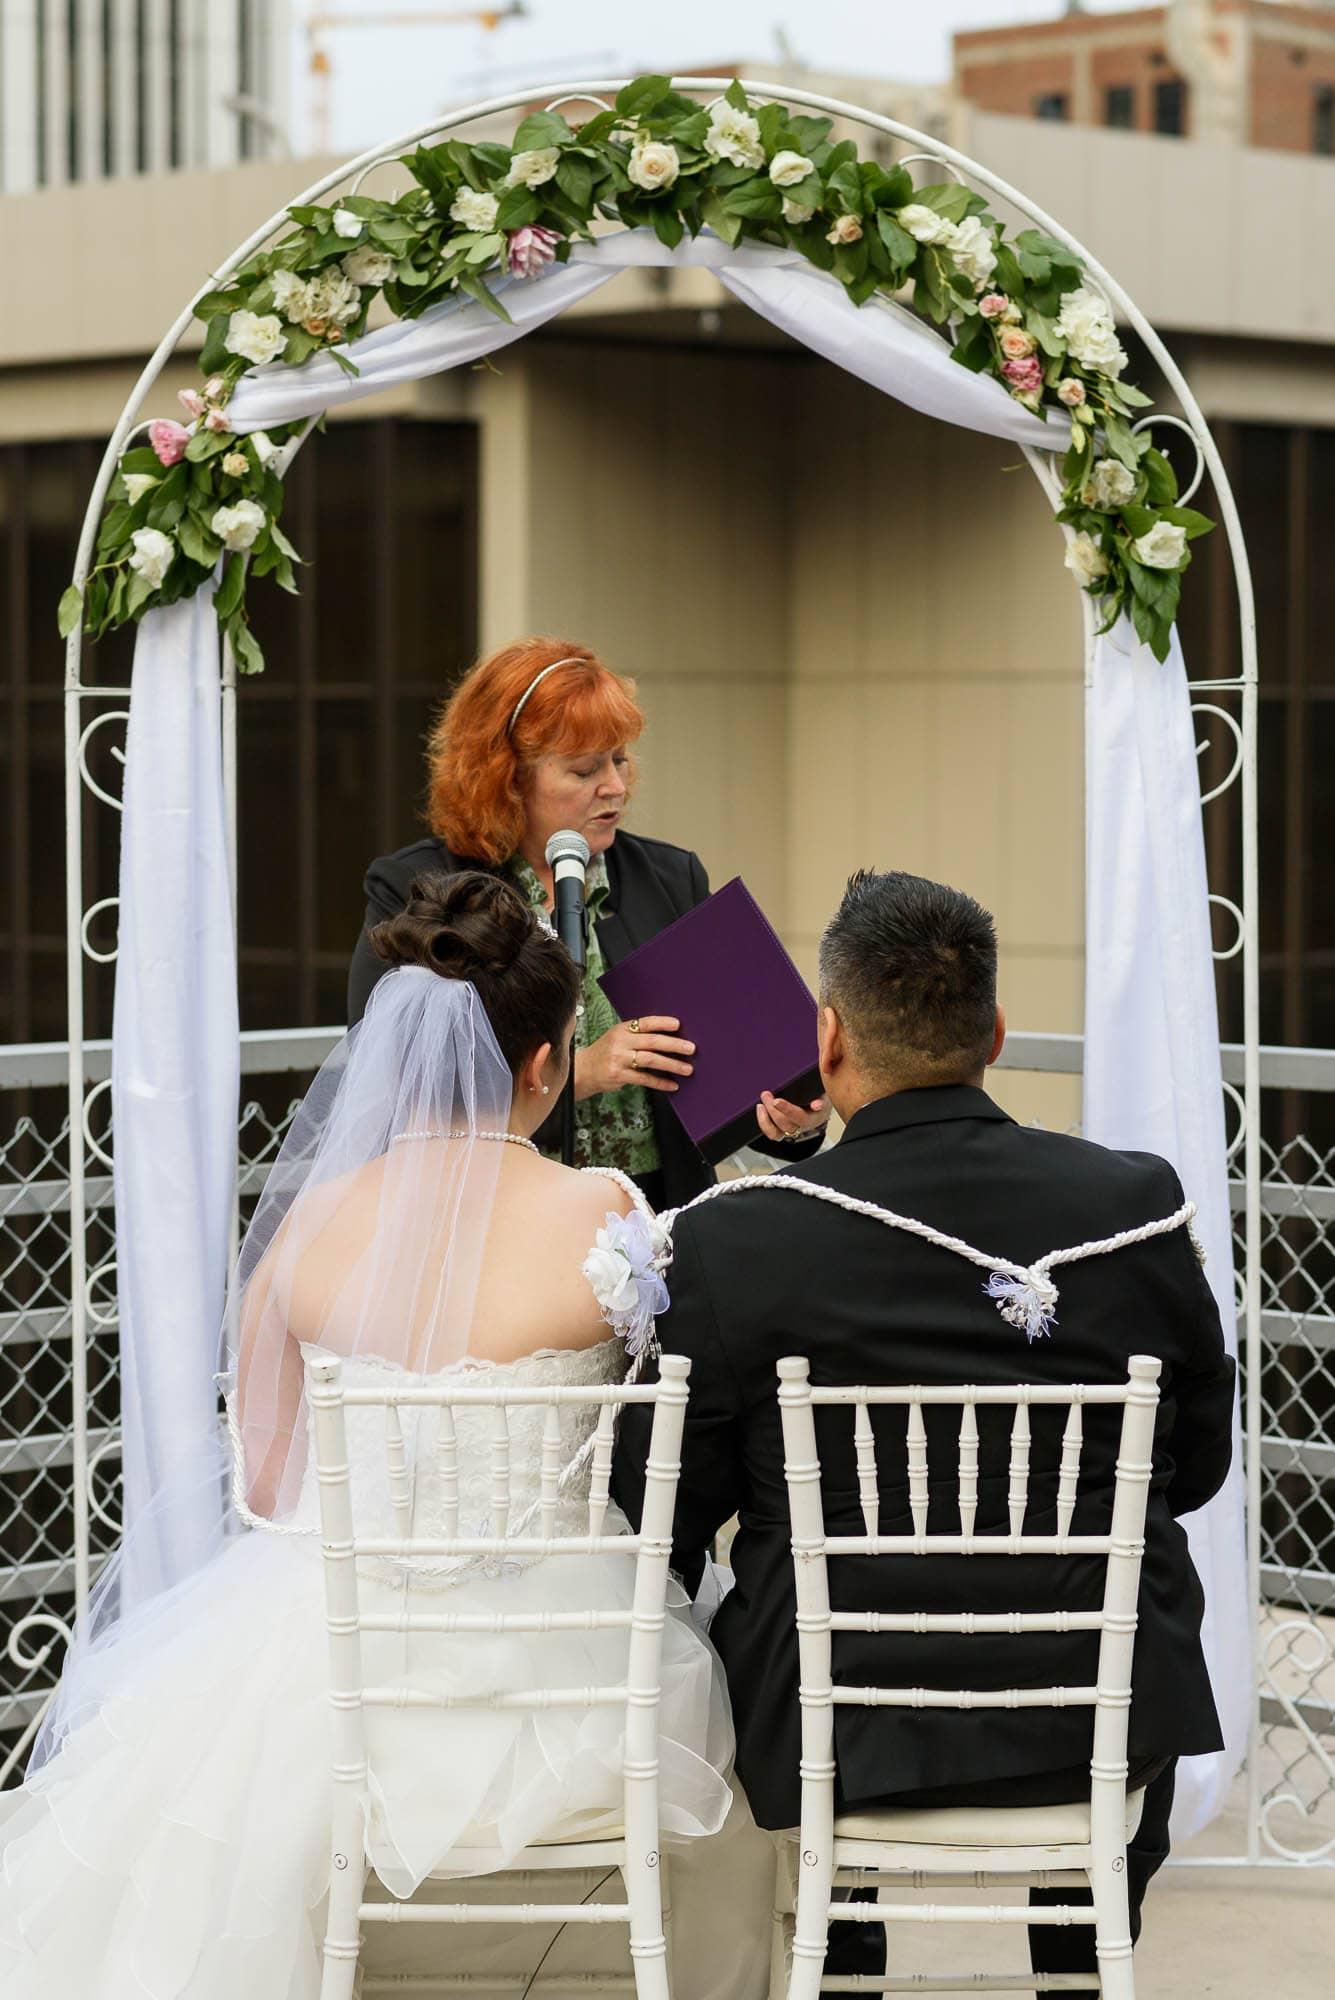 022_Alan_and_Heidi_Wedding_Nicole_Roman